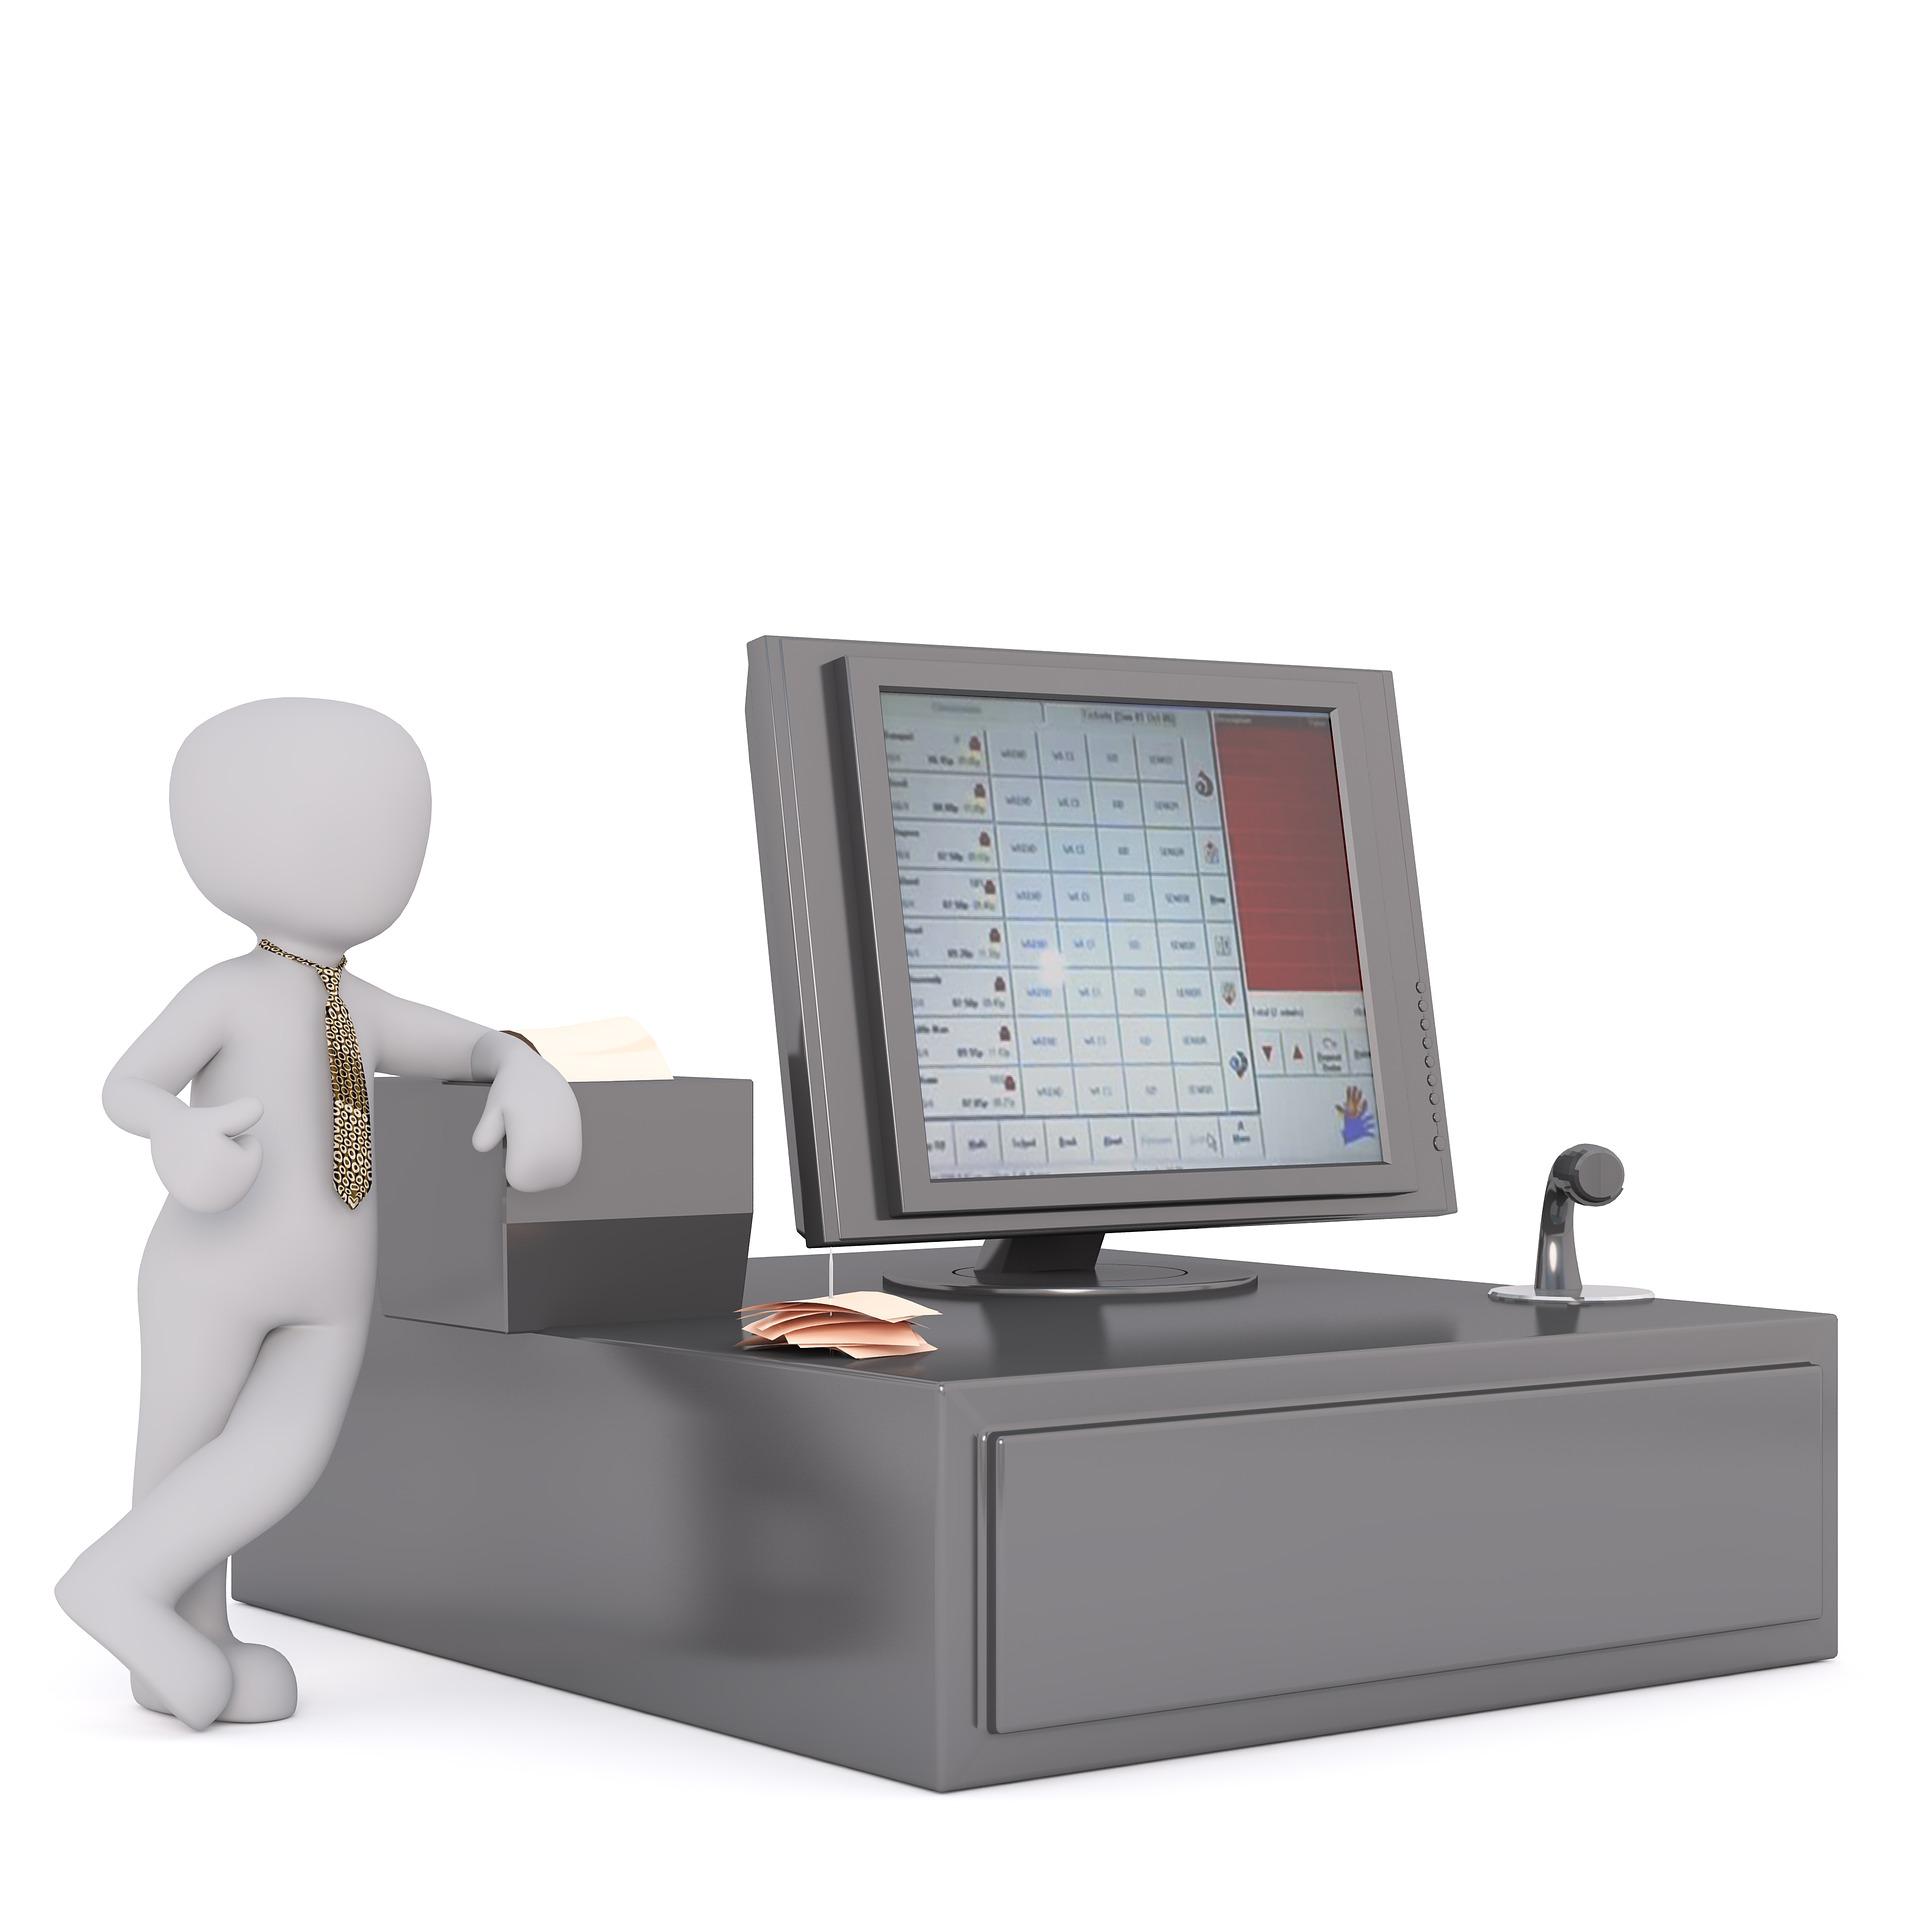 Registrierkassen: Definition, Arten, Anbieter